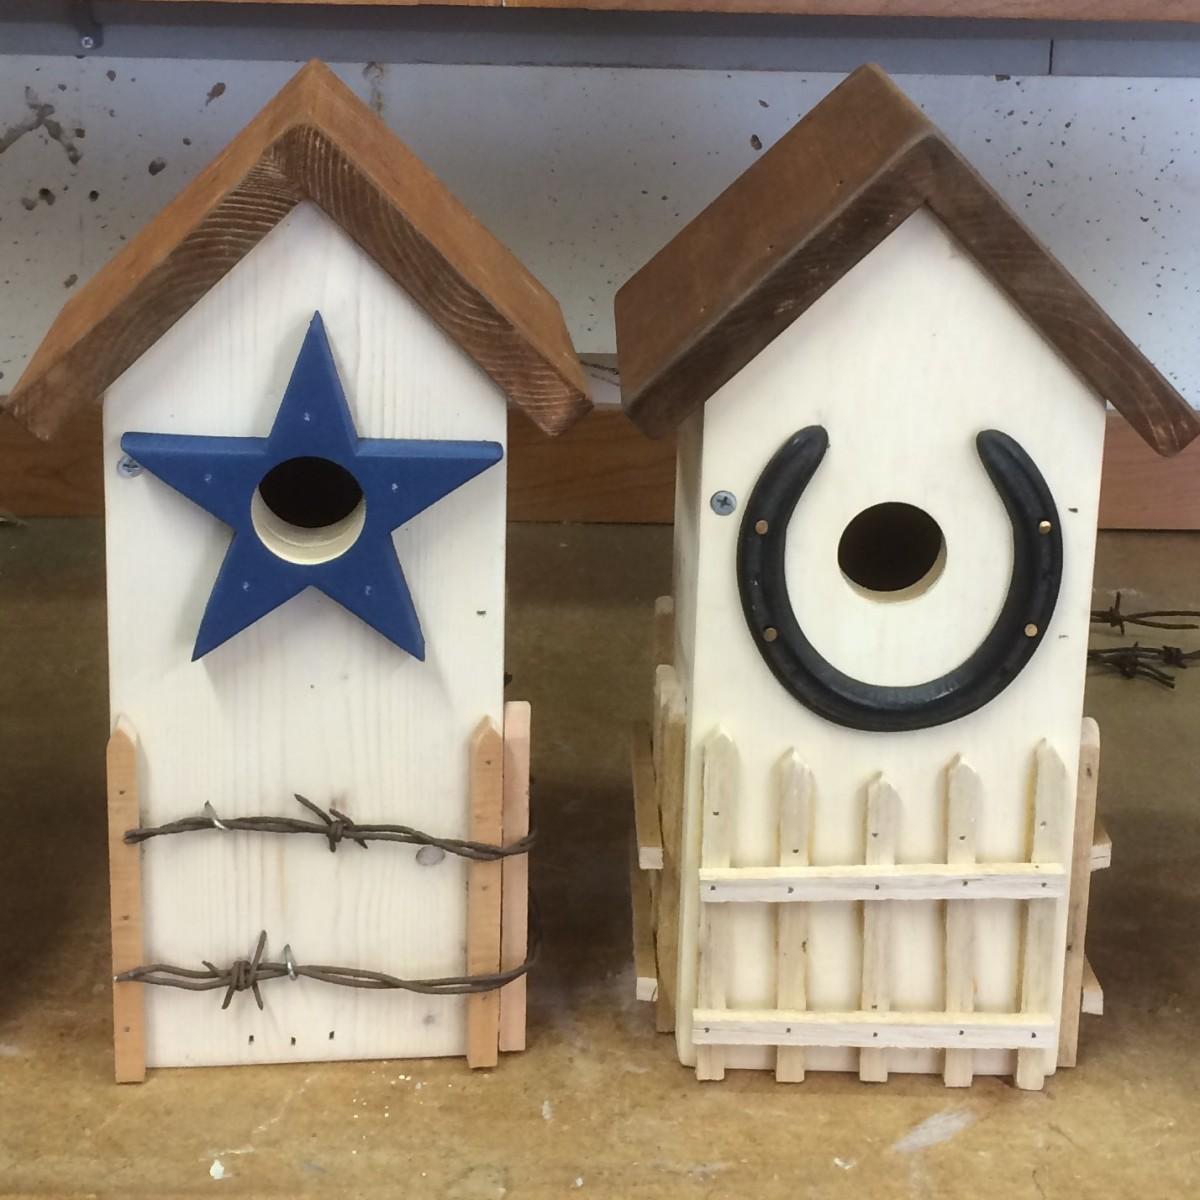 Birdhouse ideas 10 different diy birdhouse plans and for Sparrow birdhouse plans